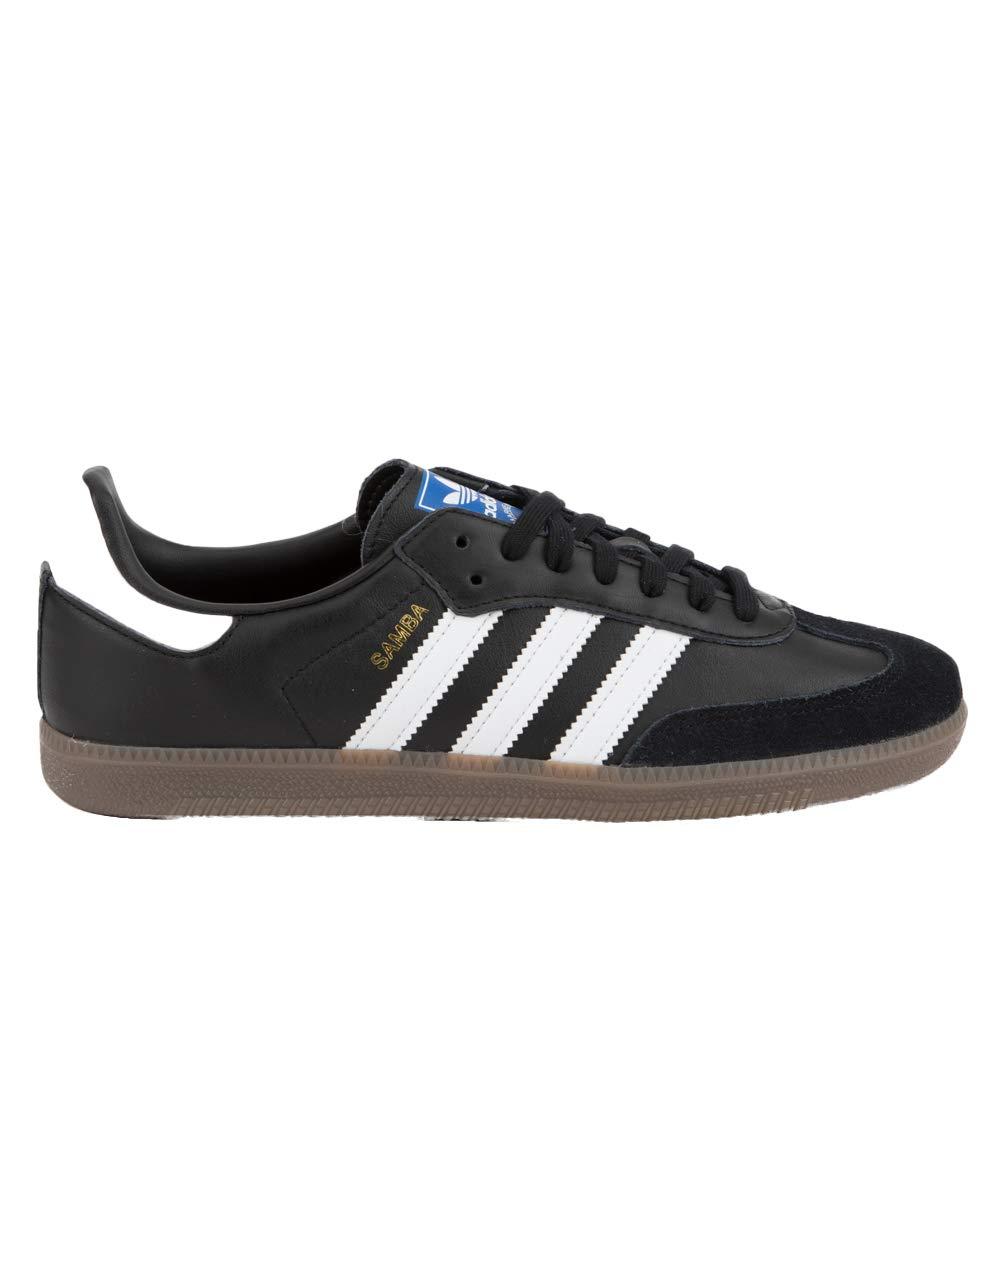 adidas Mens Samba OG Black White Gum Size 11